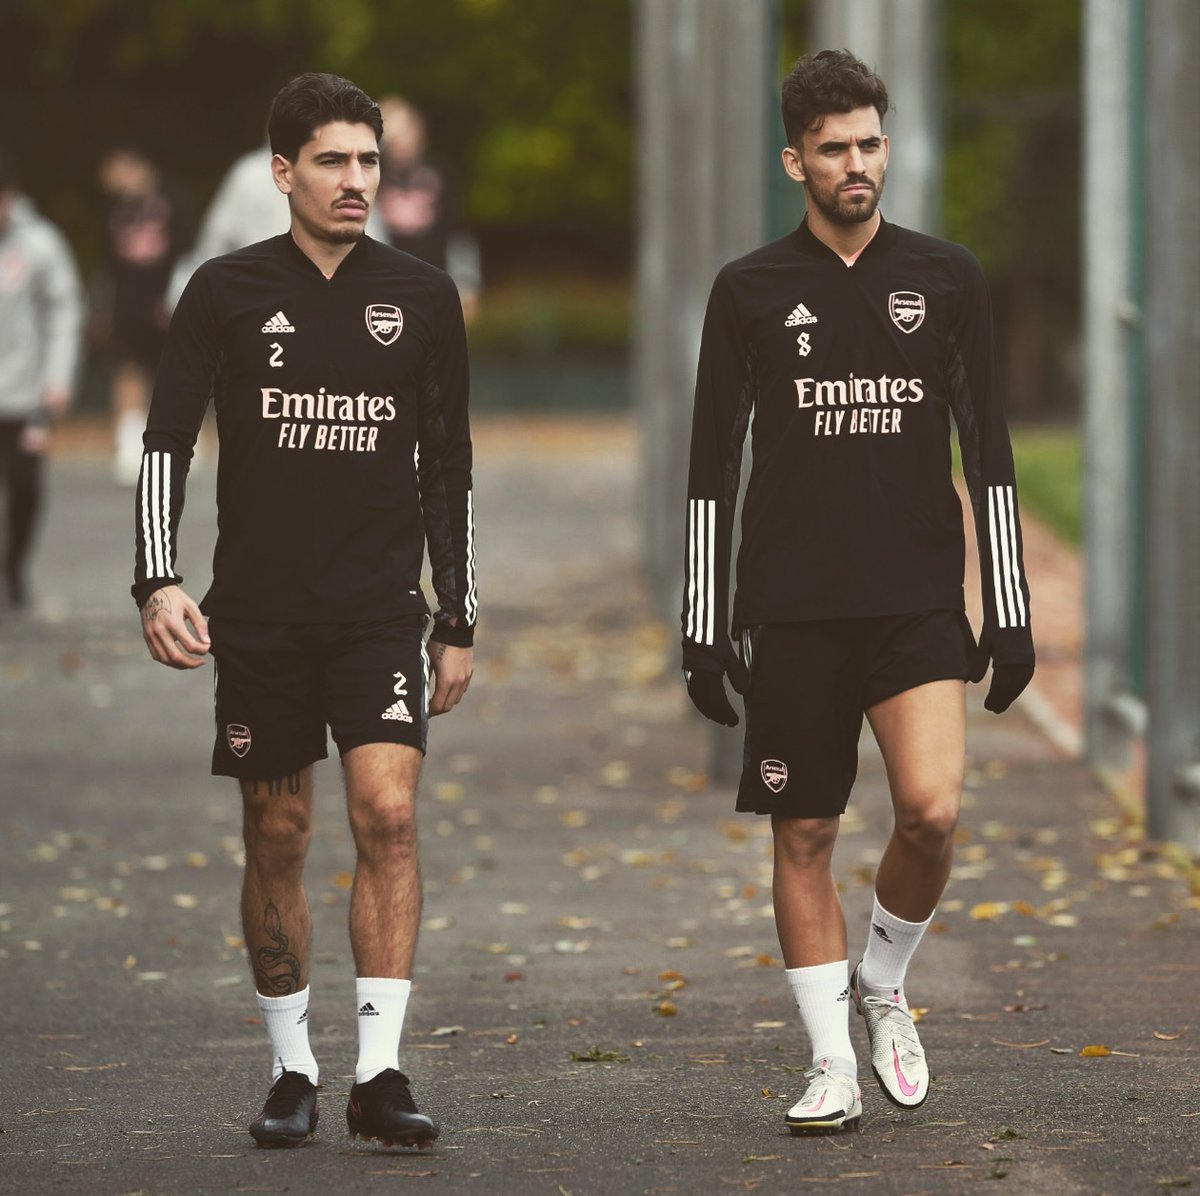 🔴⚪️ Look straight ahead, brother. Always forwards! 🤜🏼🤛🏼@hectorbellerin  @Arsenal #EuropaLeague #TrainingDay